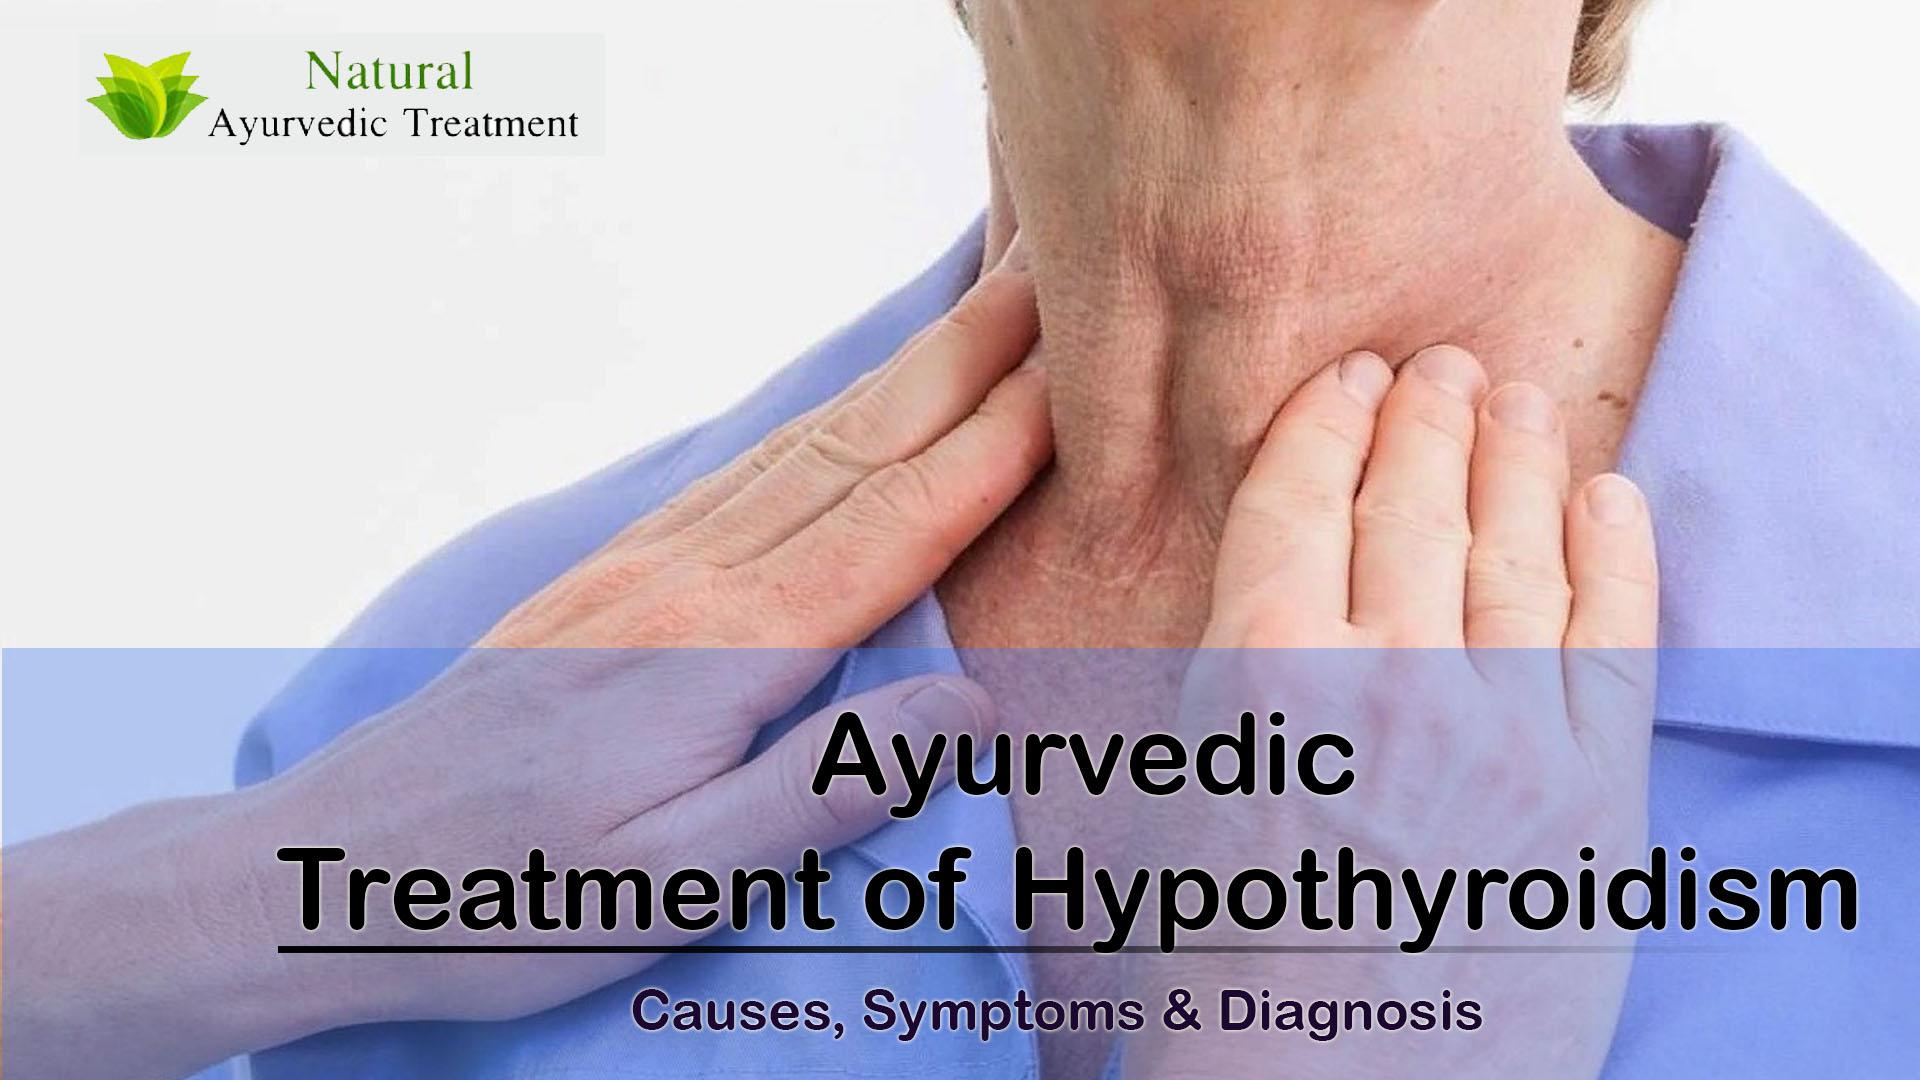 Ayurvedic Treatment of Hypothyroidism - Causes, Symptoms & Diagnosis